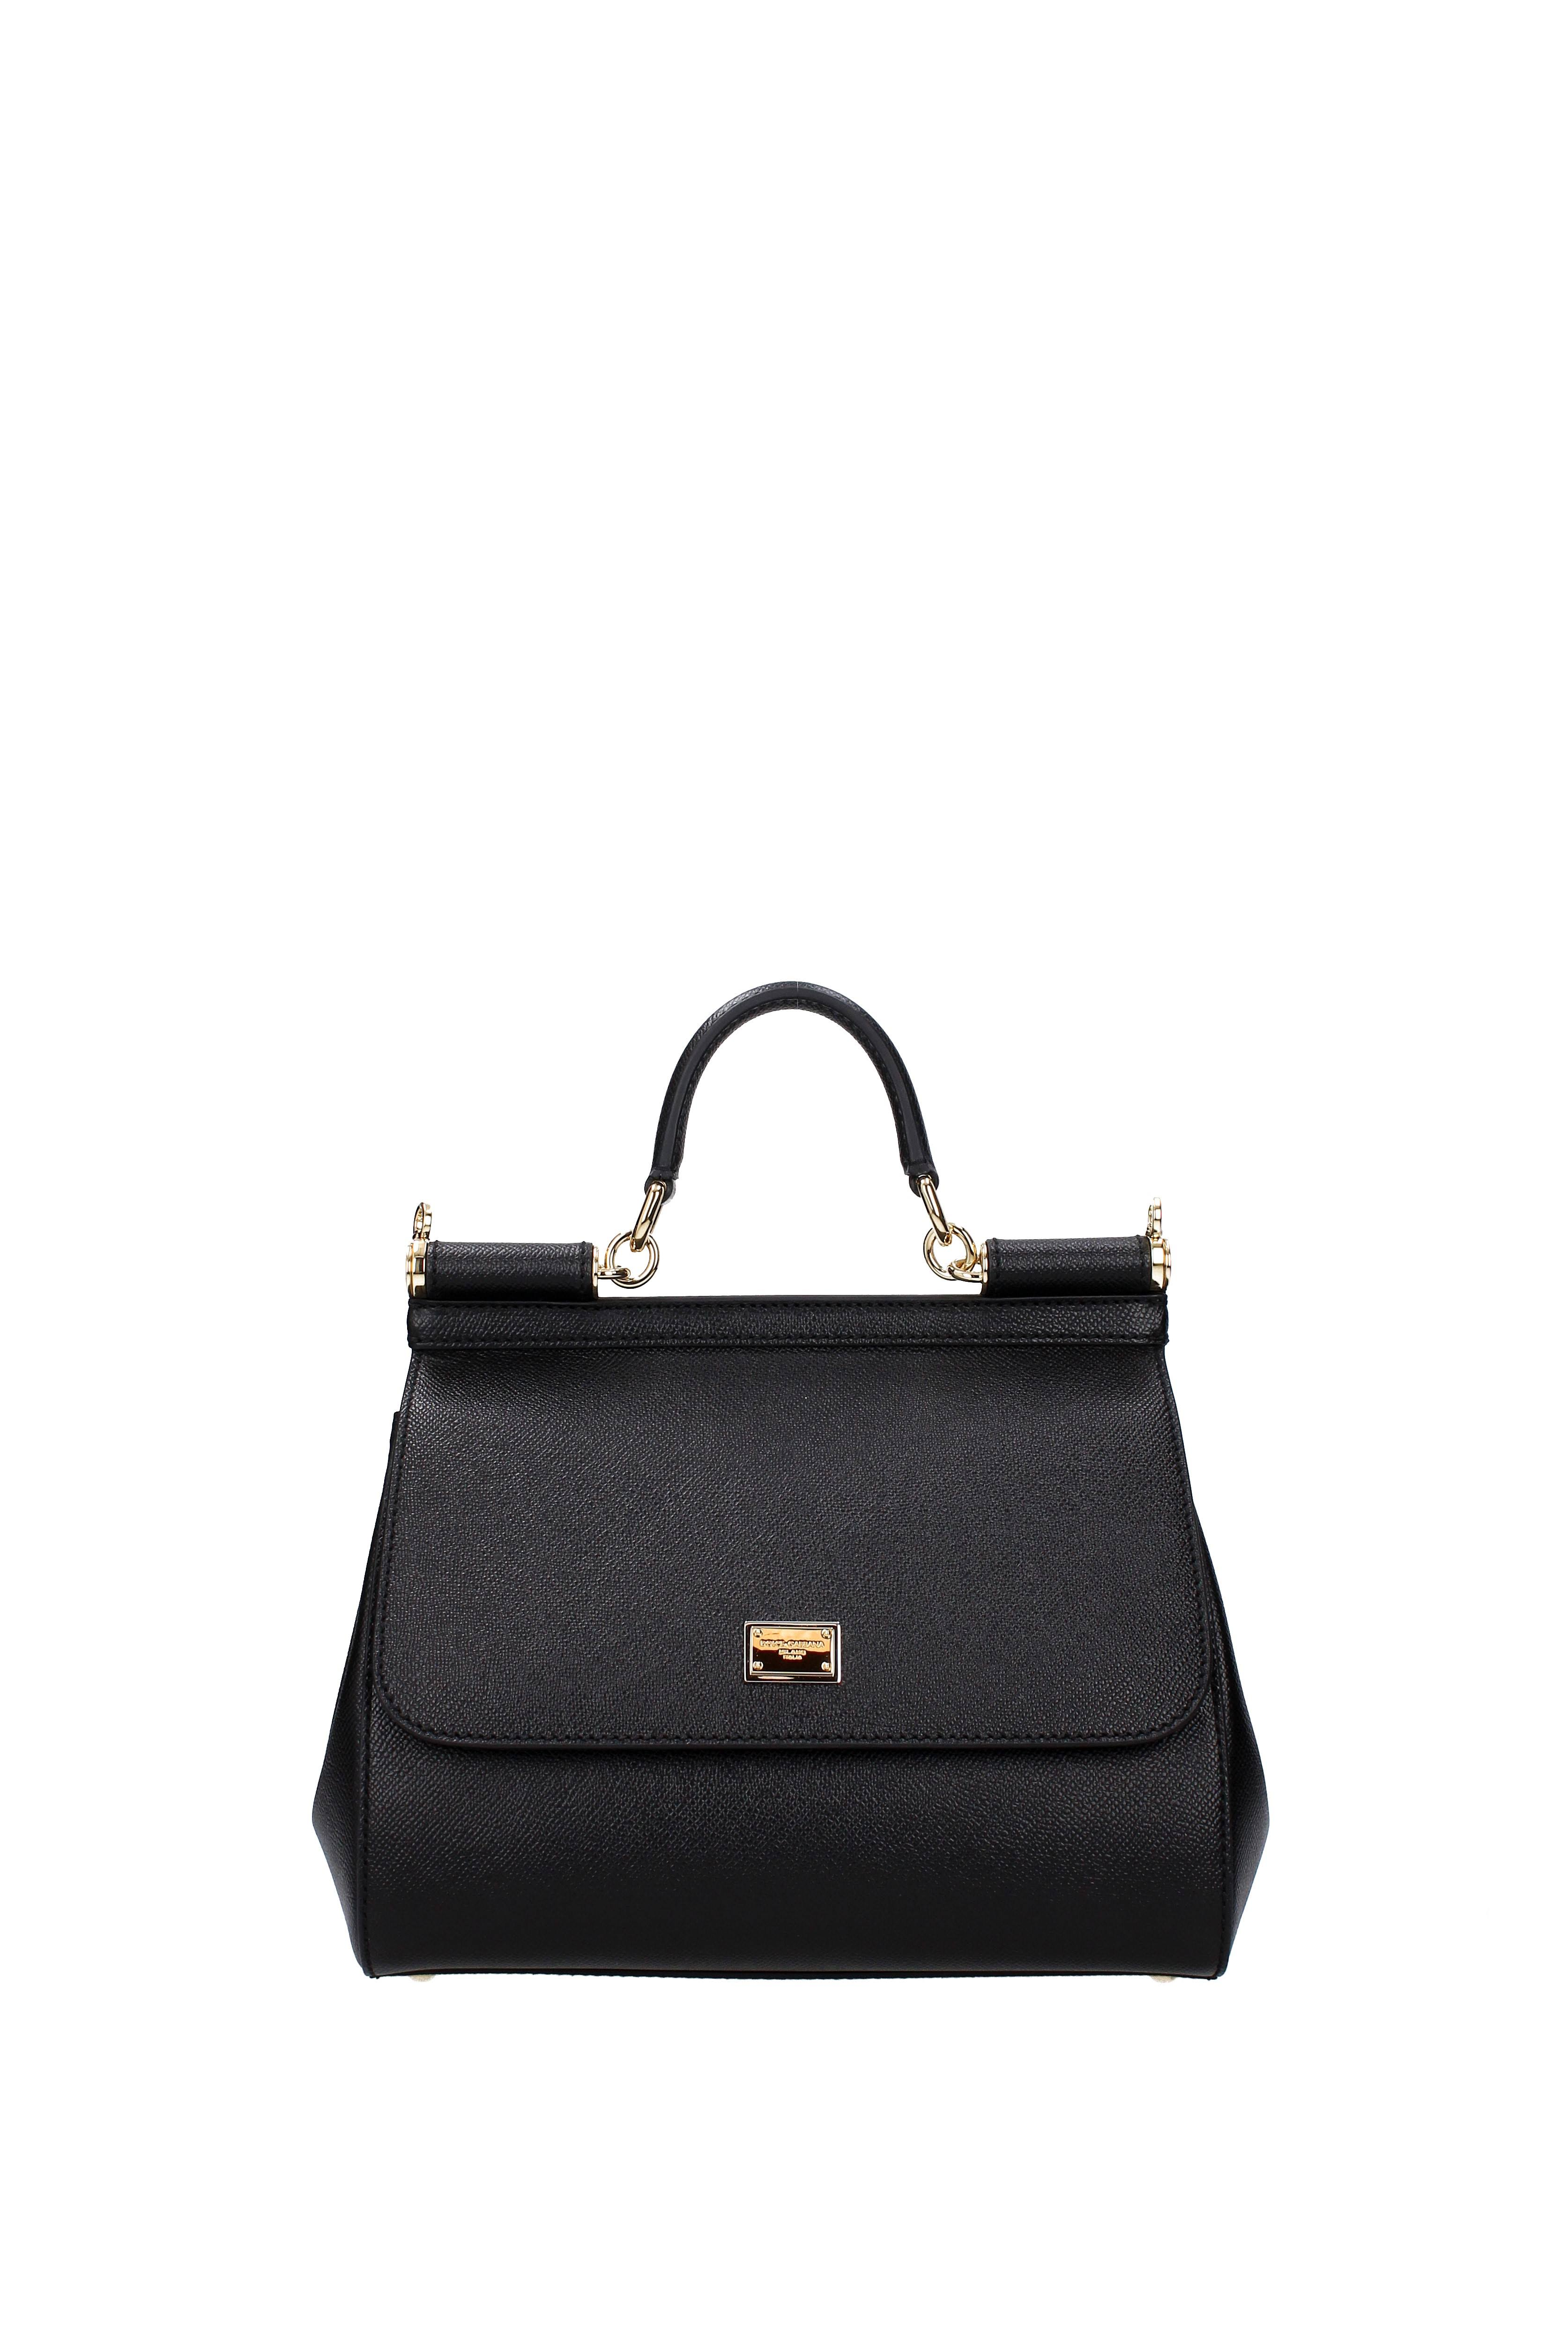 Leather Nero Dauphine Bag Medium DolceGabbanaSicily Donna Nero OuPXTkZi